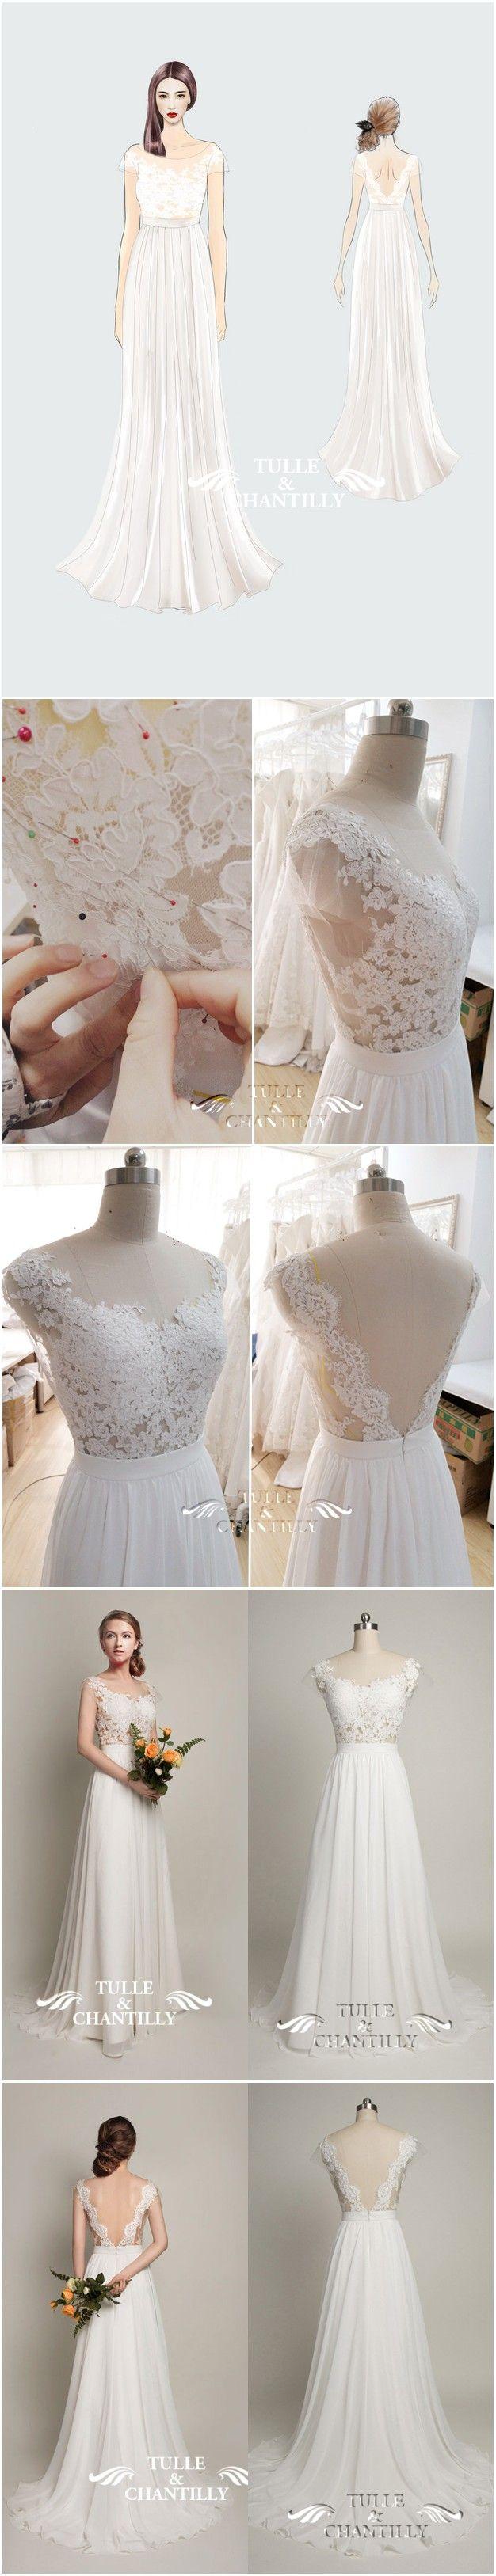 Design your own wedding dress cheap  Design Your Own Wedding Dress Gorgeous Customized Long Chiffon